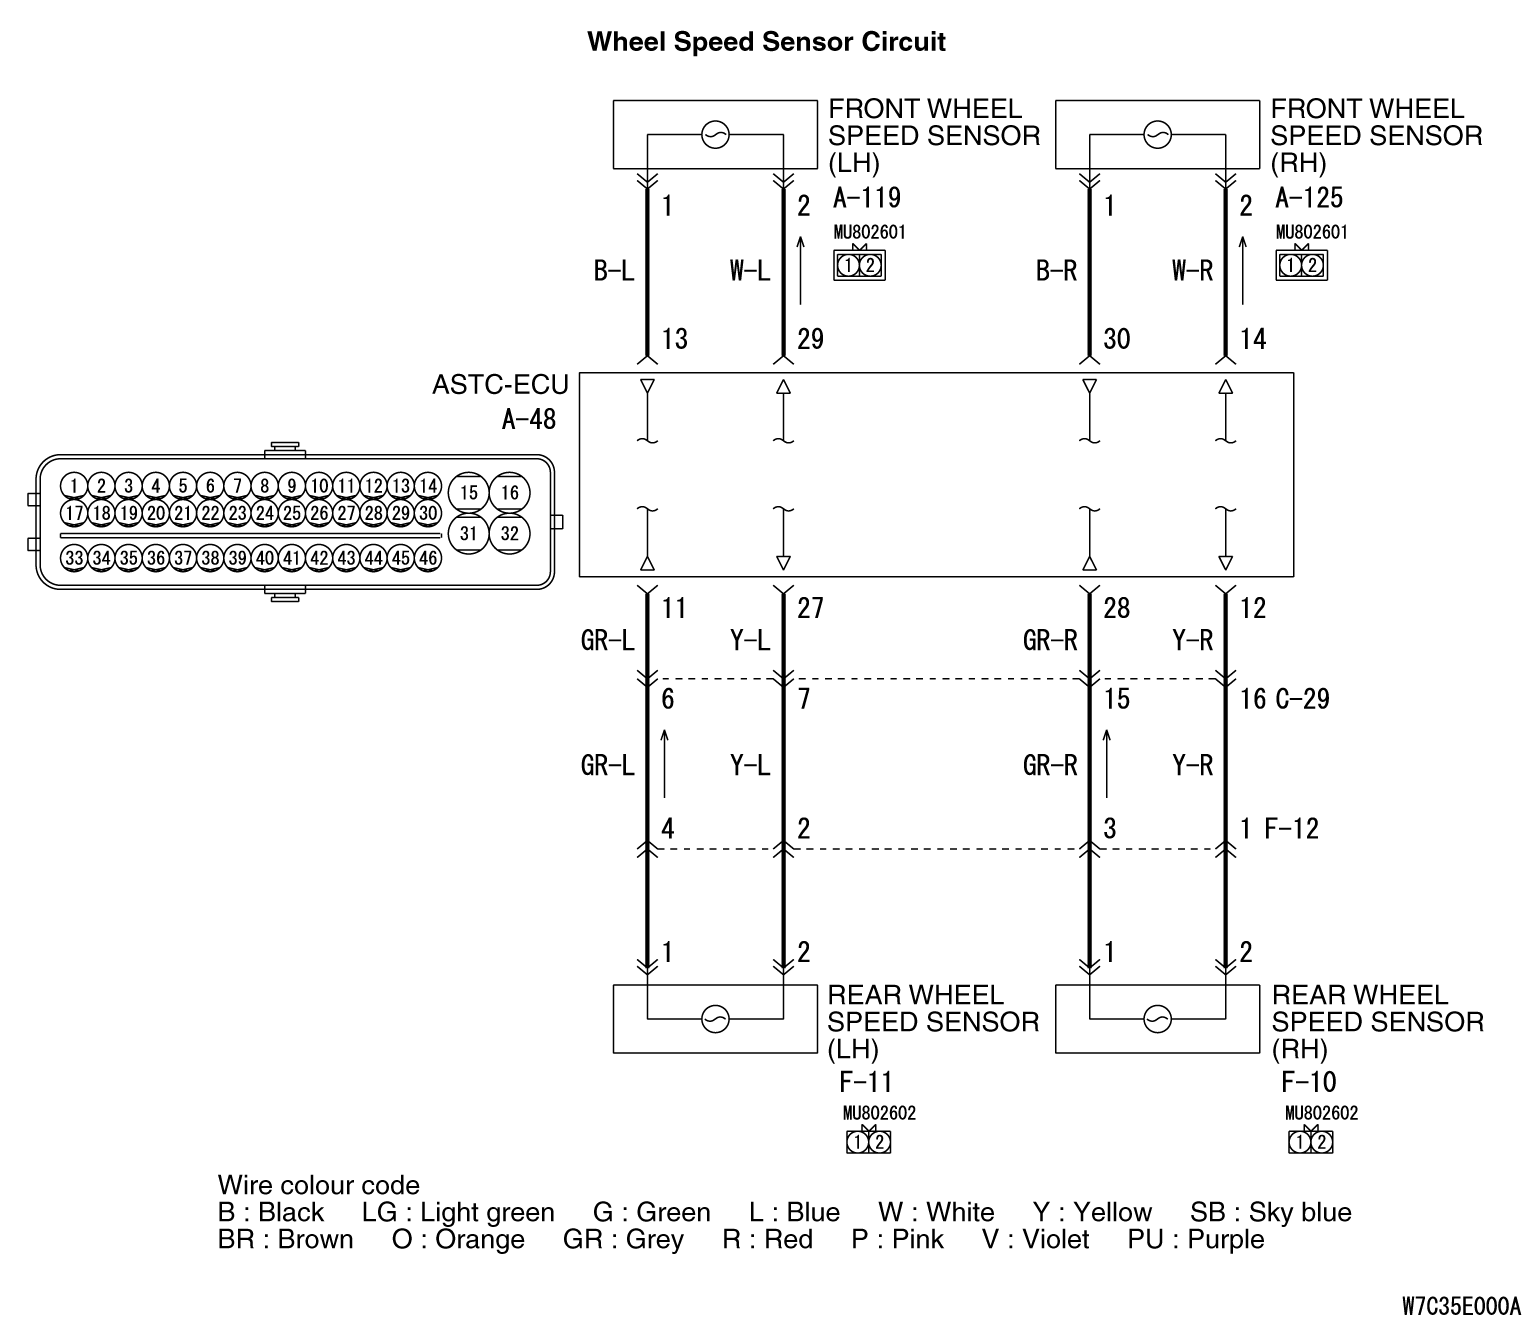 Code No C1201: Wheel Speed Sensor (FR) System (Sensor Transmitting